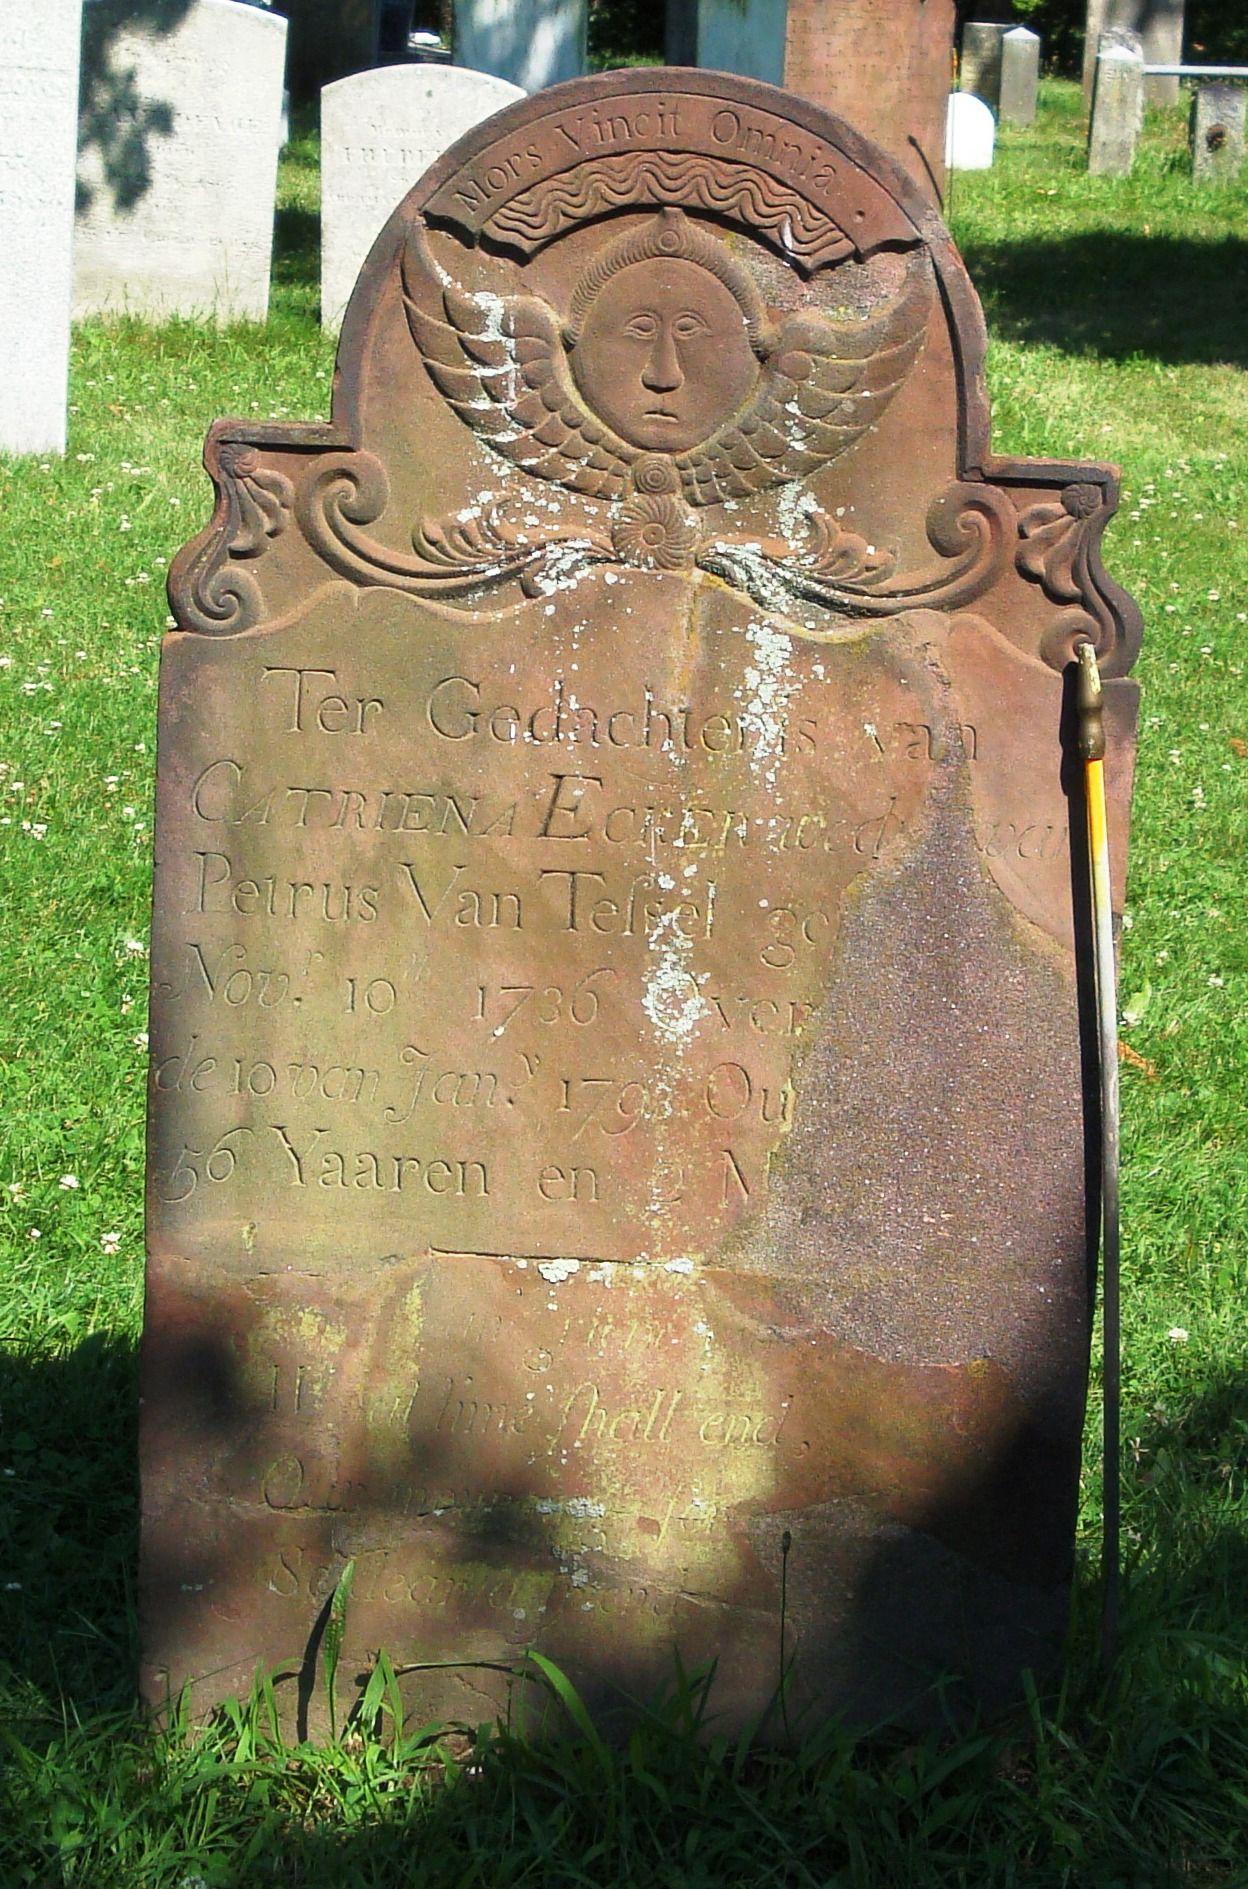 Grave of Catriena Ecker Van Tessel